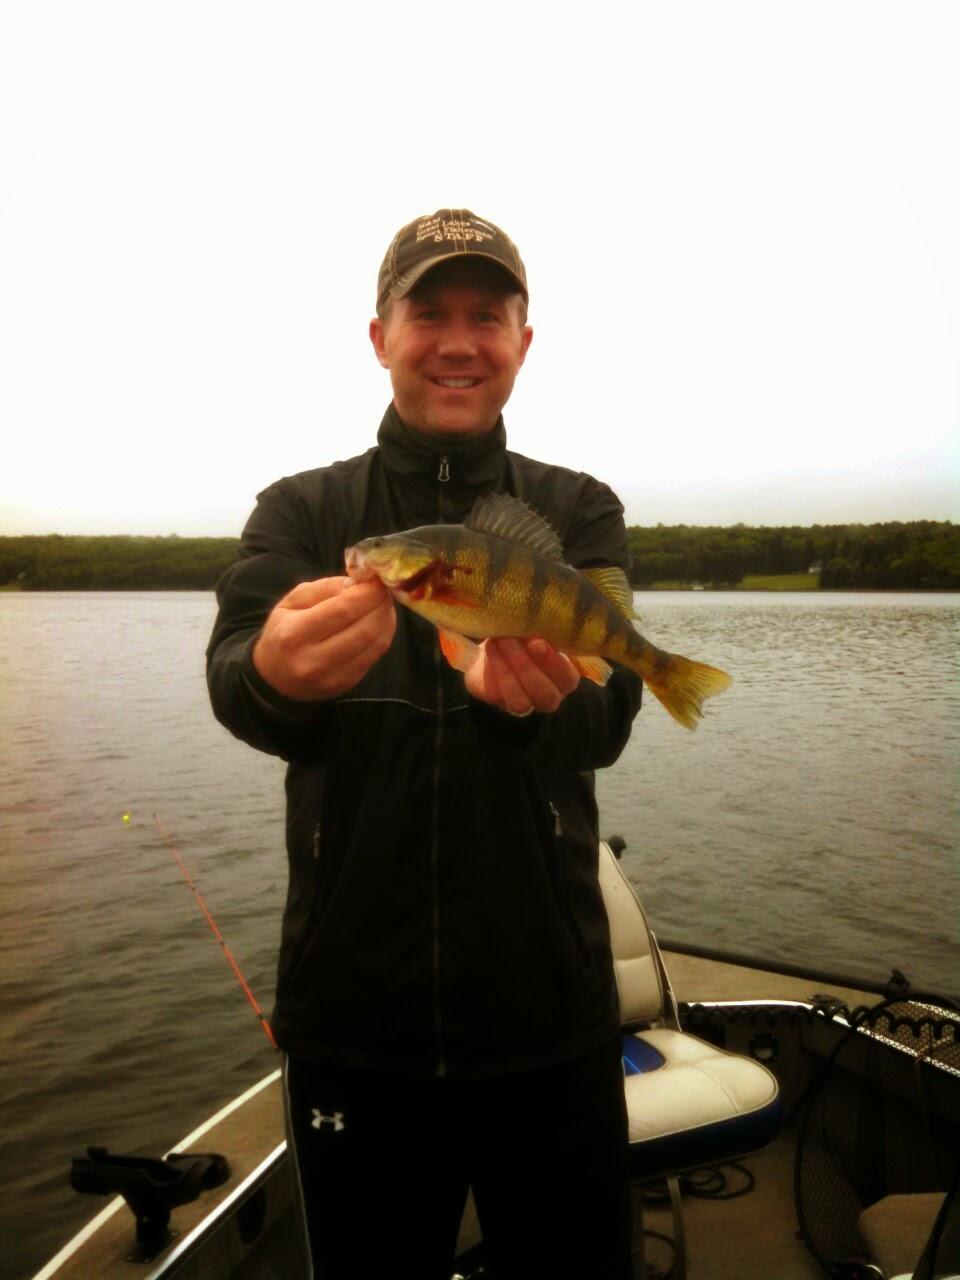 Wisconsin fishing reports lake gogebic perch fishing for Lake gogebic fishing report